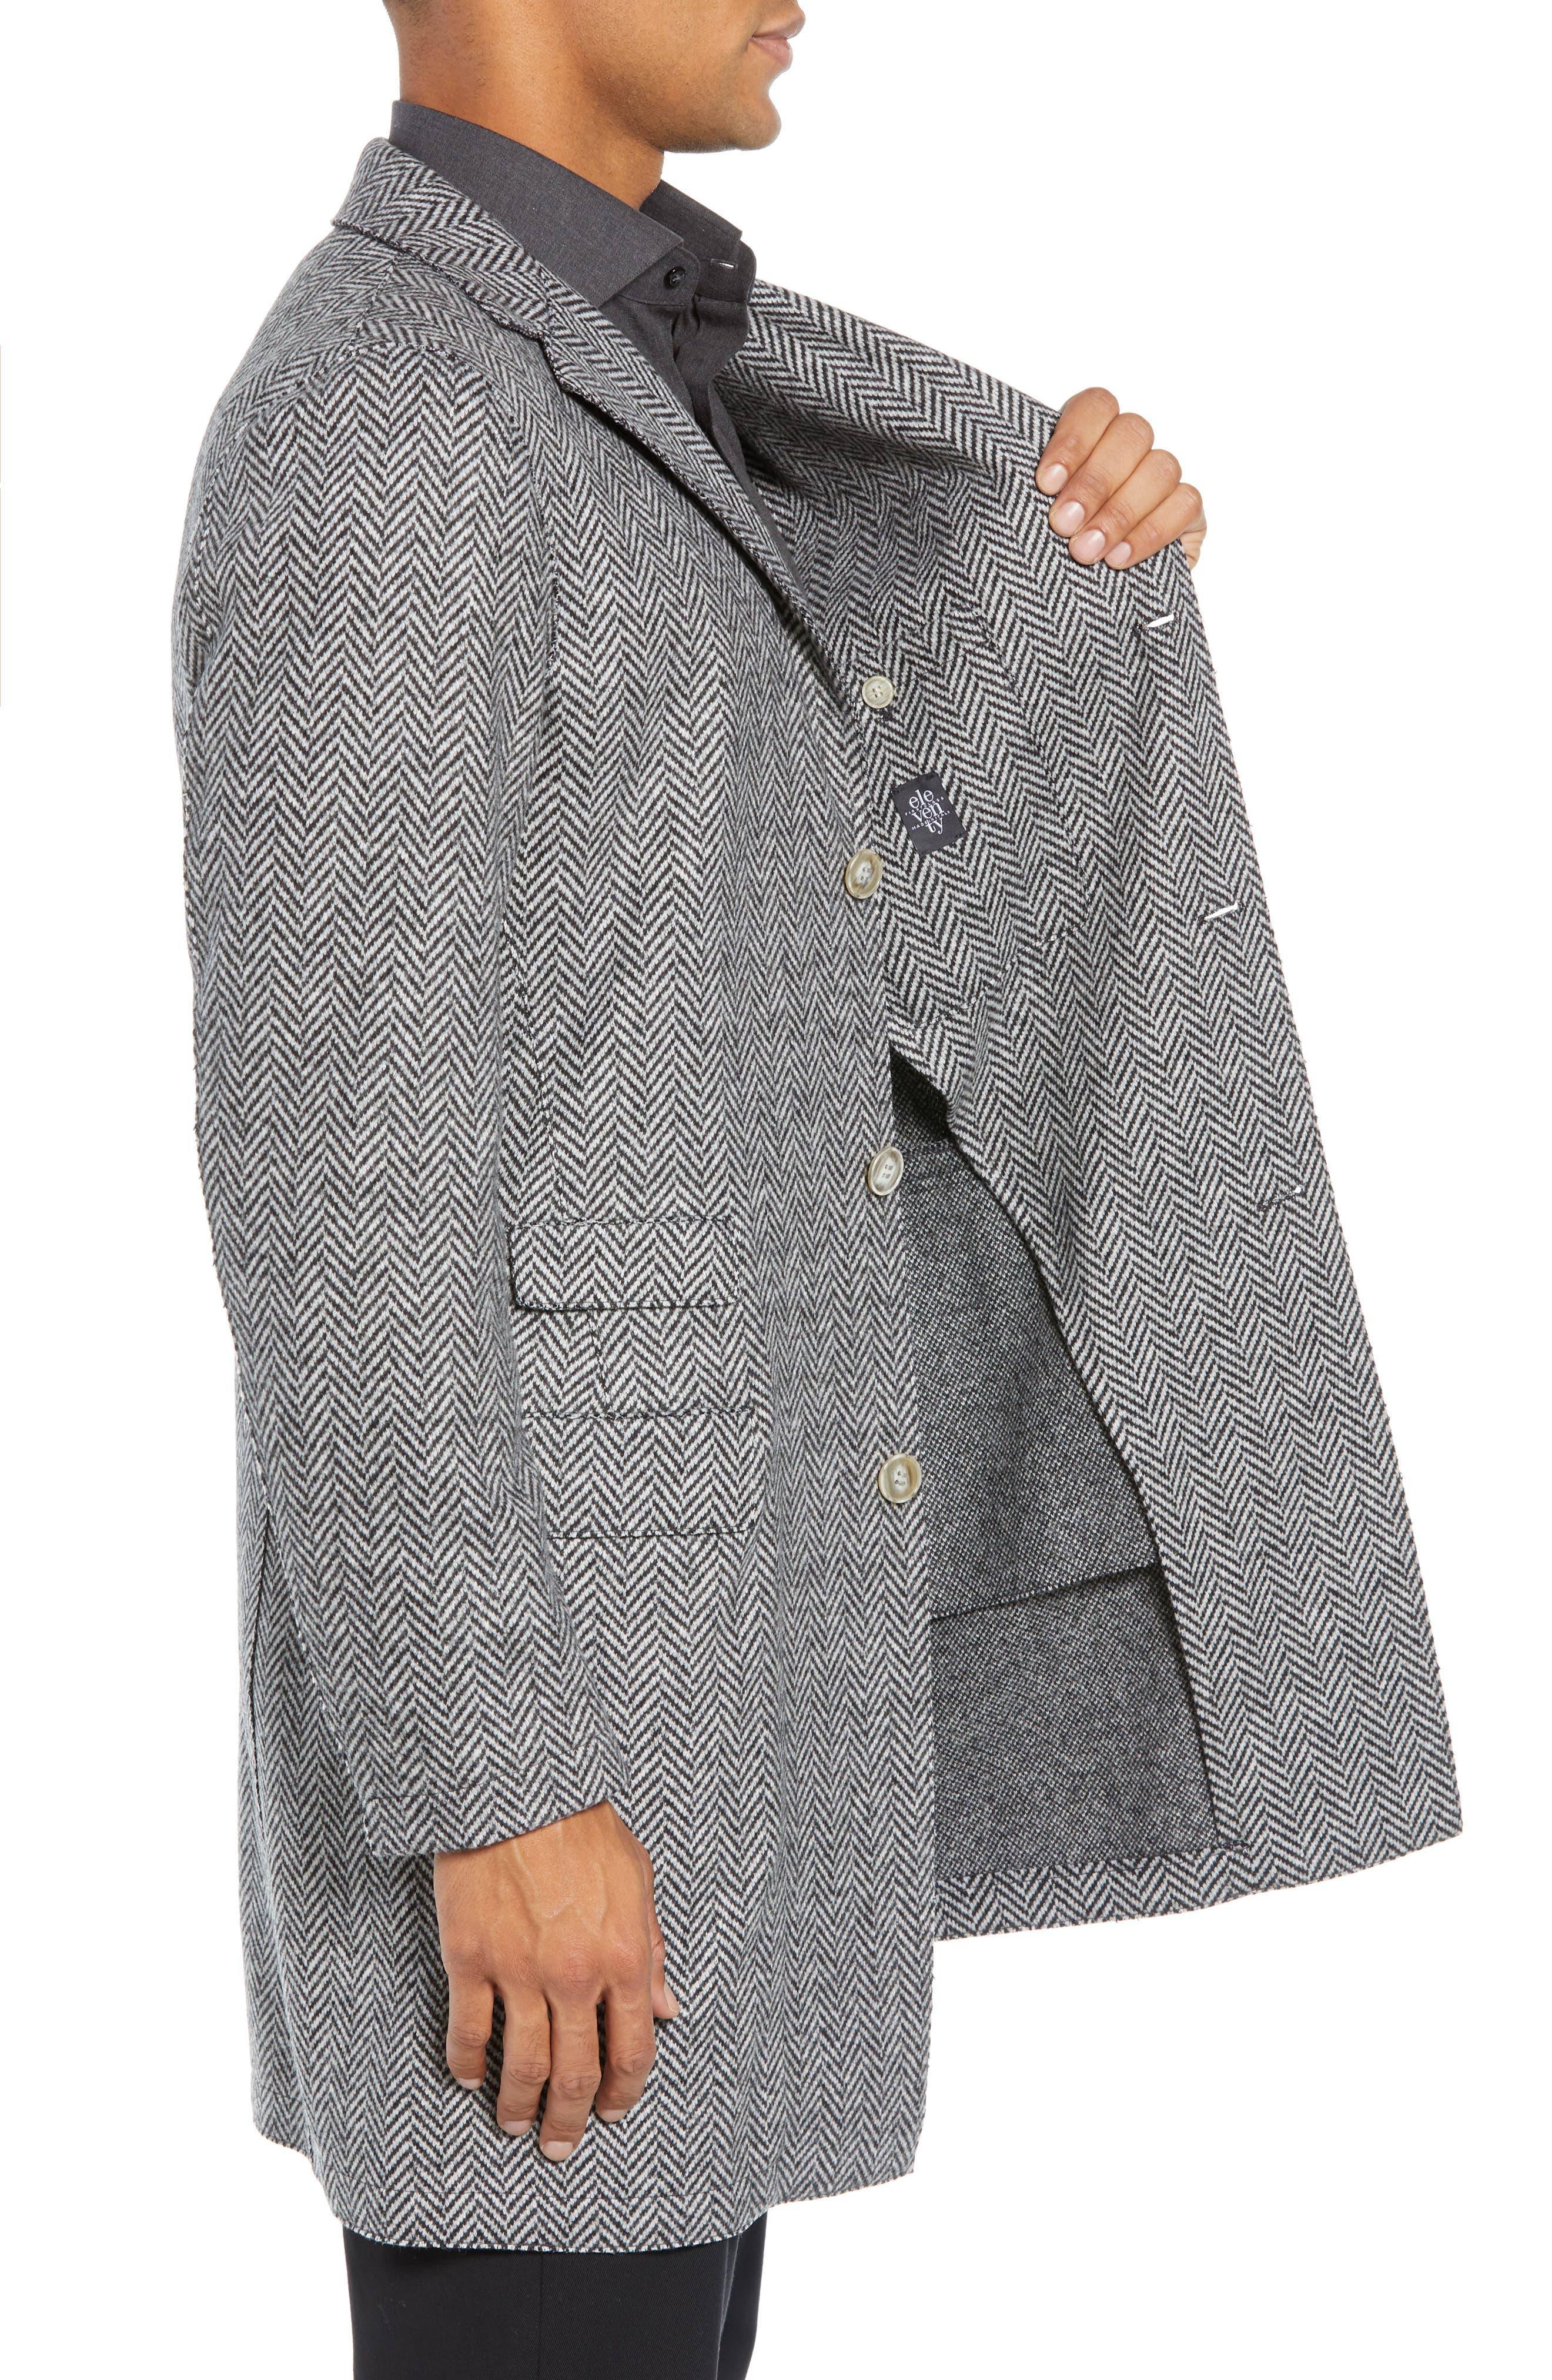 Trim Fit Wool Blend Top Coat,                             Alternate thumbnail 3, color,                             GREY